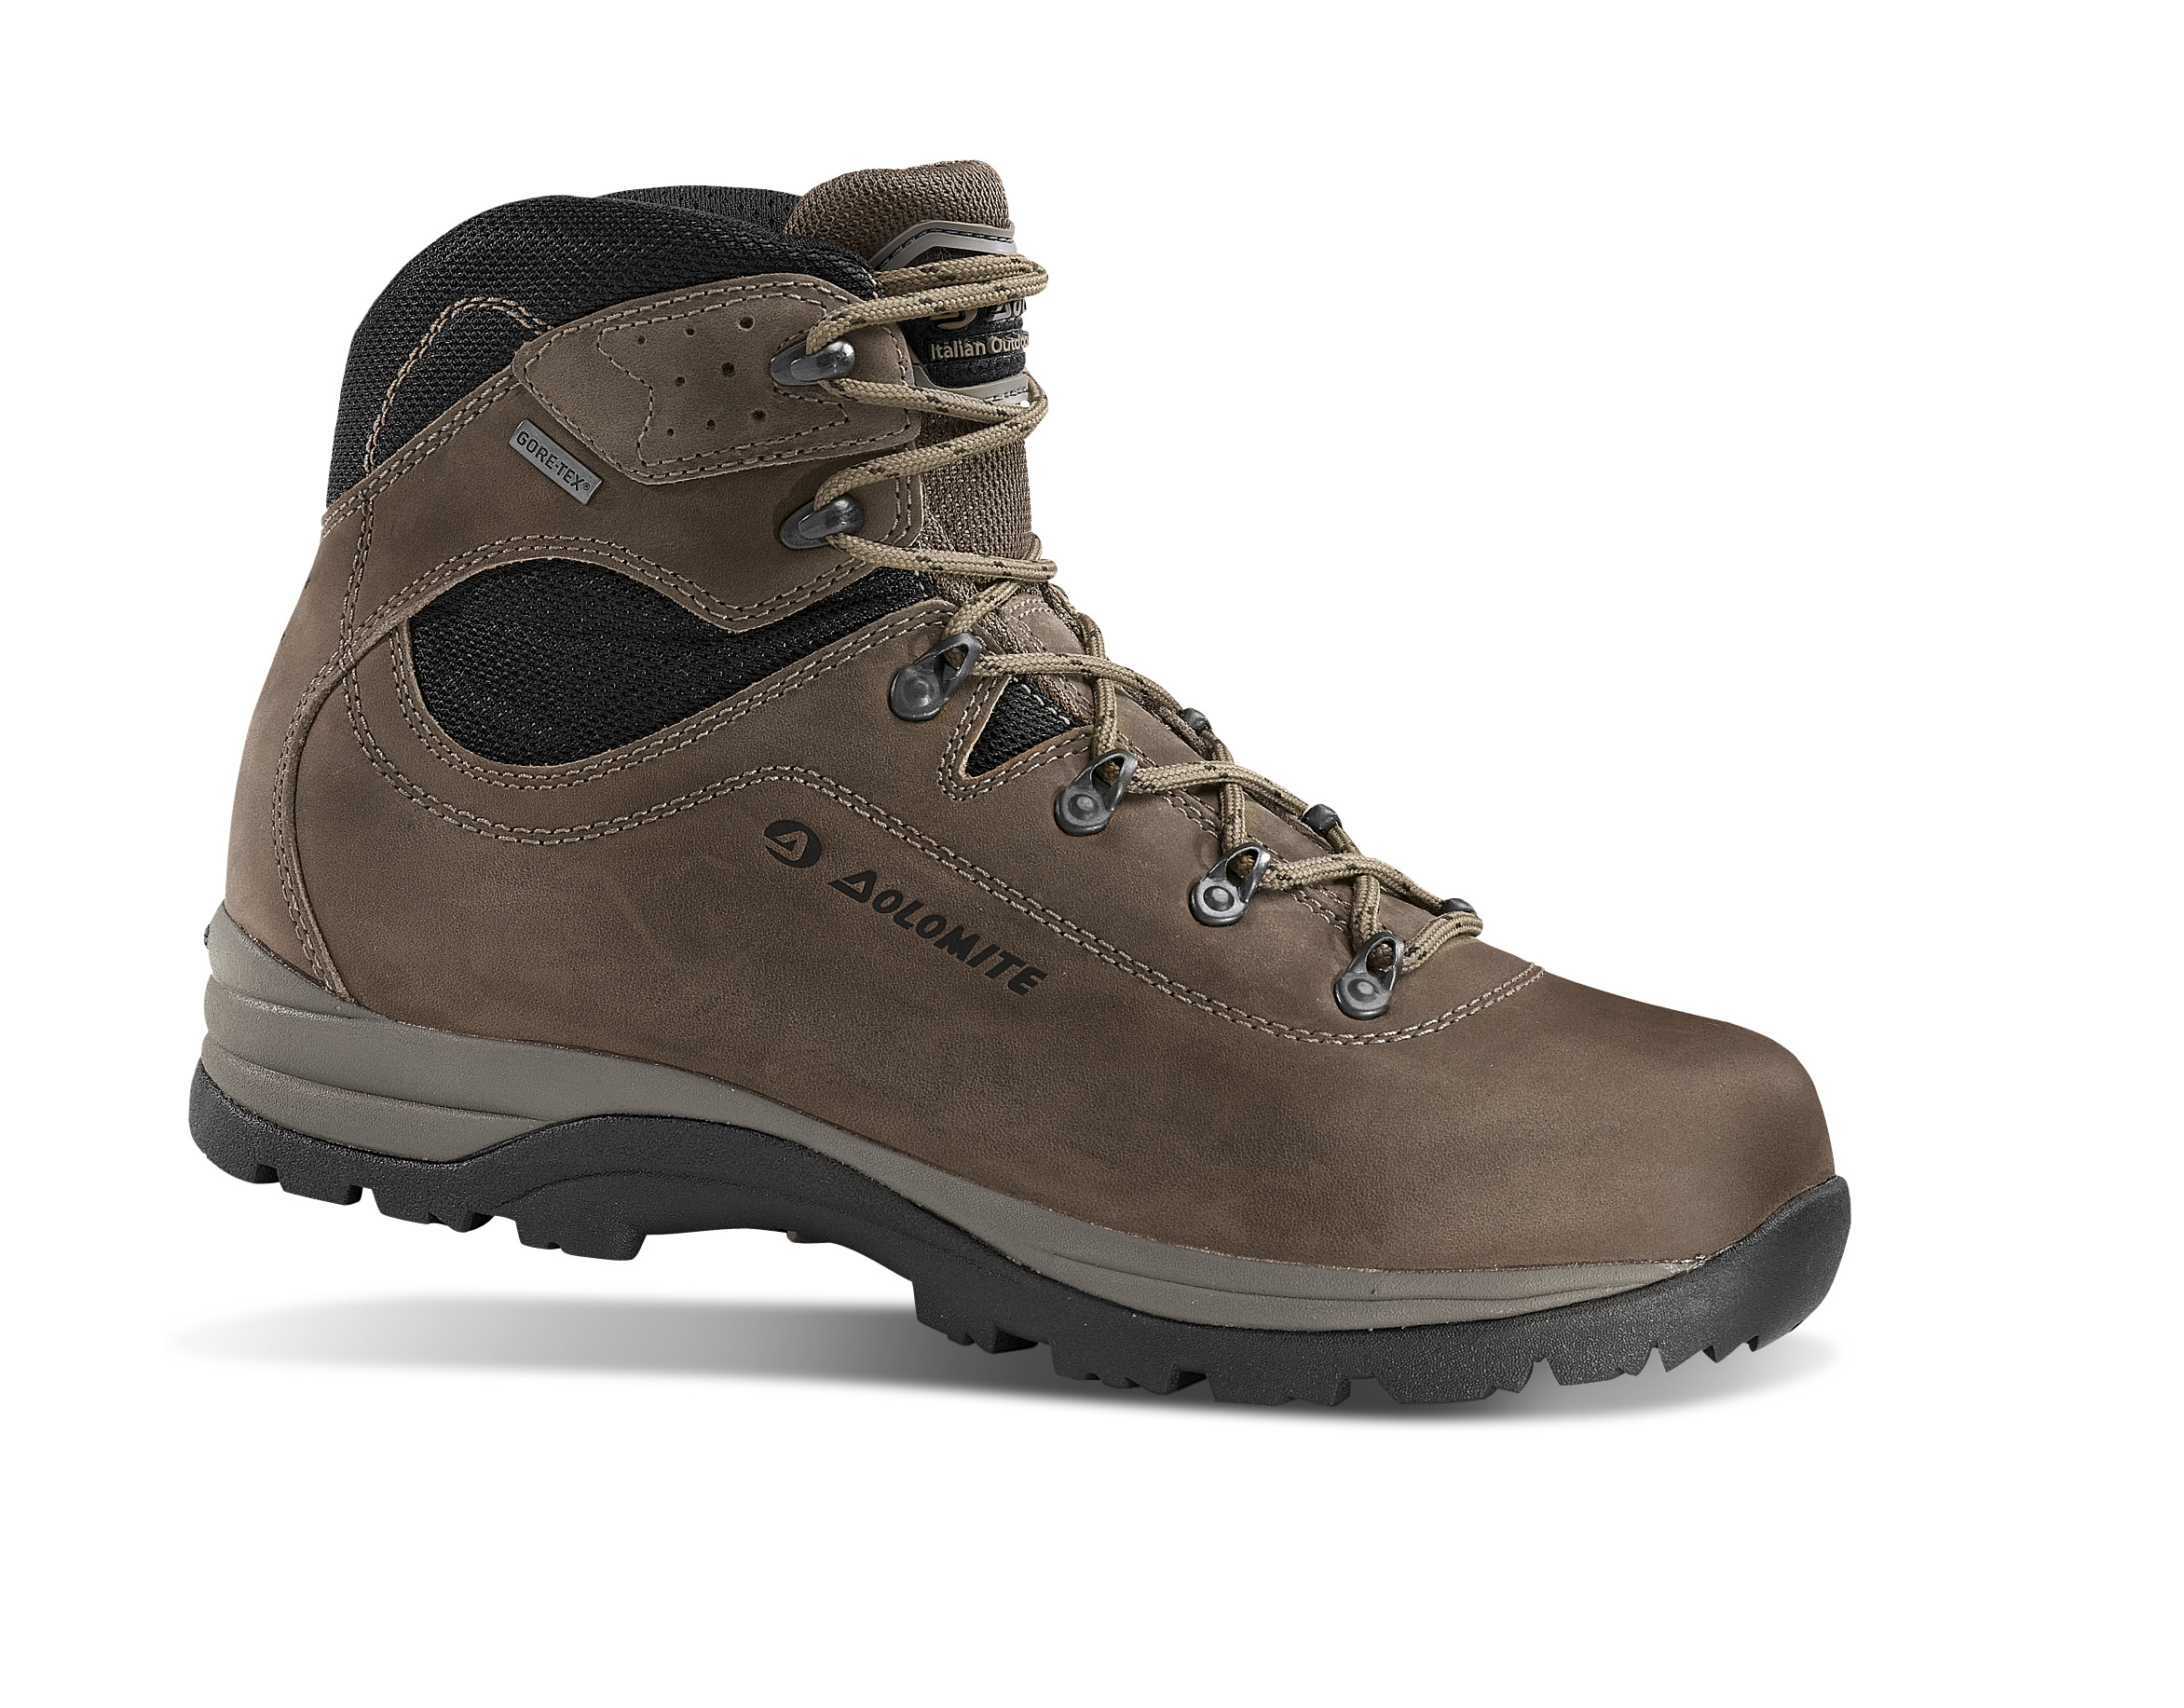 obuv dolomite APRICA FG GTX® dark brown (85554900 015)